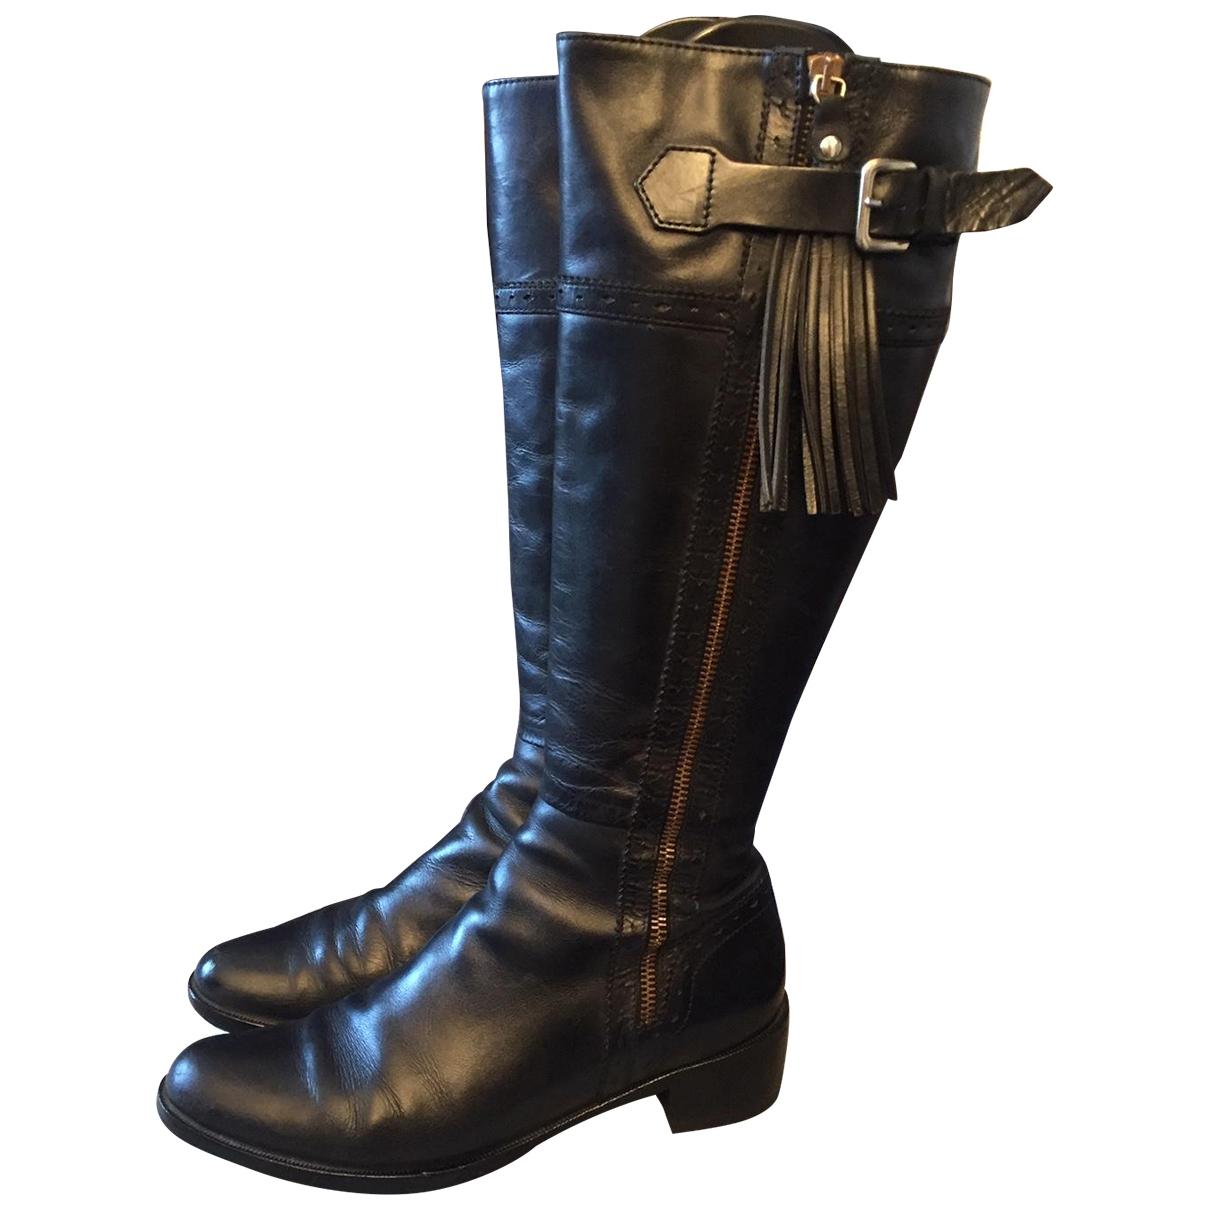 Lk Bennett - Bottes   pour femme en cuir - noir